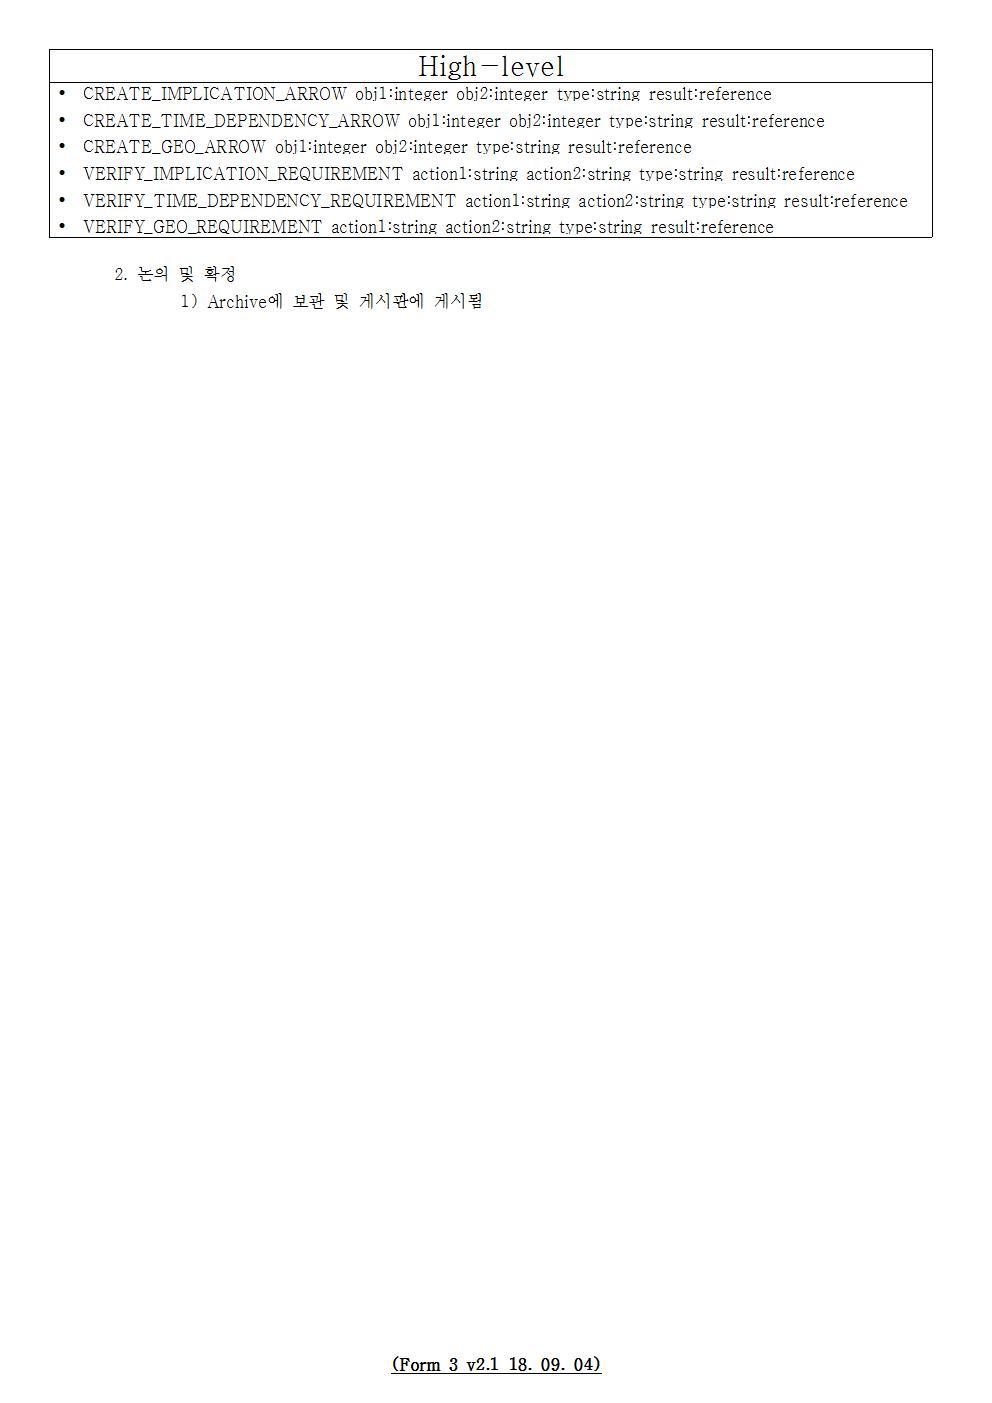 D-[18-001-RD-01]-[SAVE 3.0]-[2018-10-22][SH]002.jpg